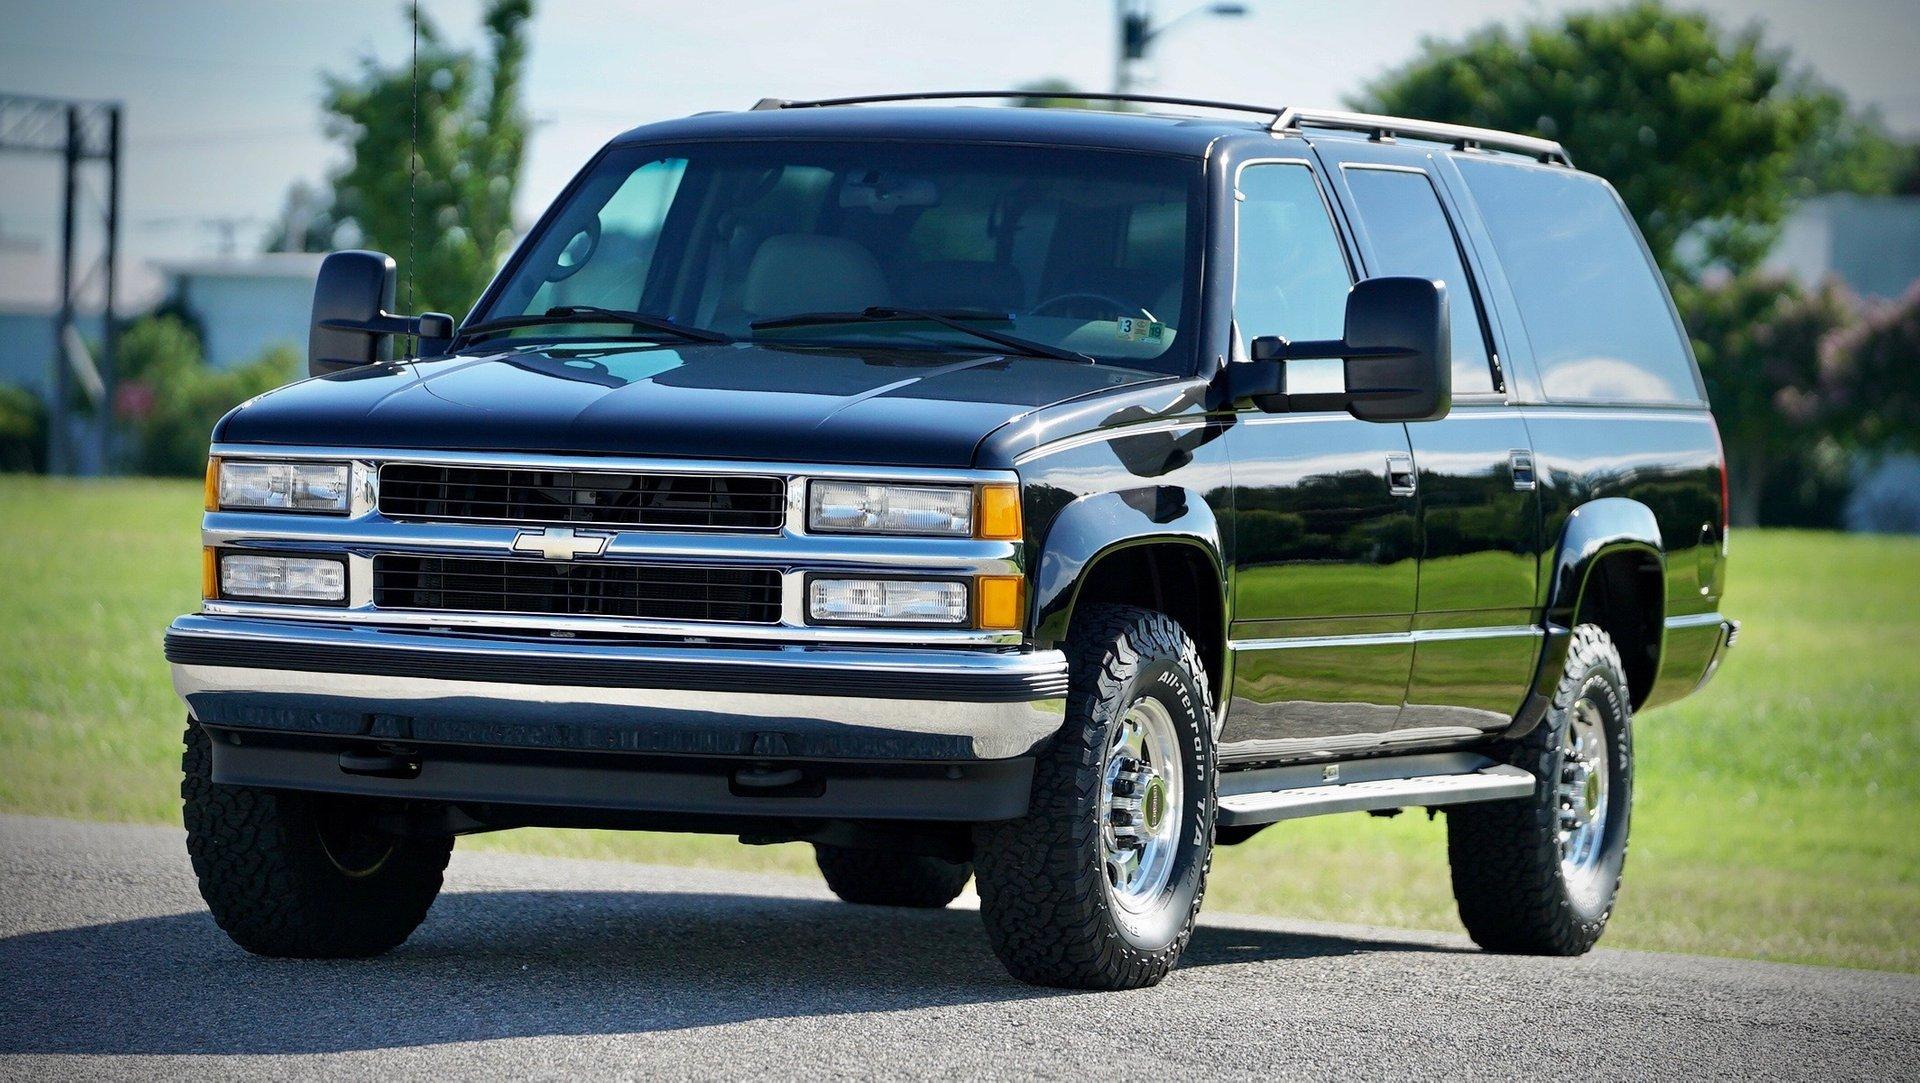 1996 chevrolet suburban 2500 4wd